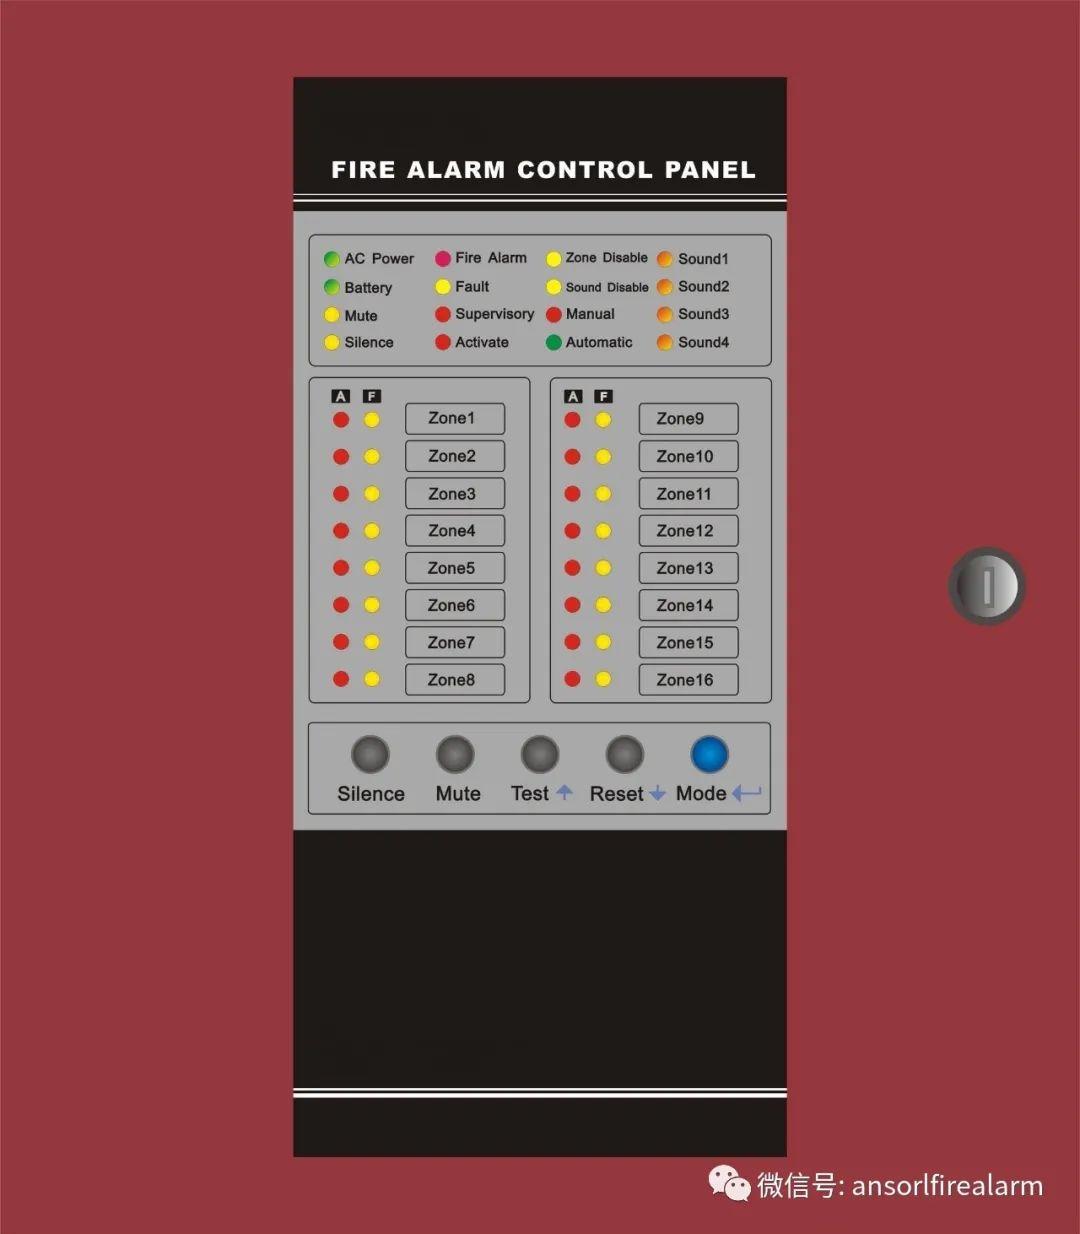 Conventional Fire Alarm Control Panel Model No. ASBFP